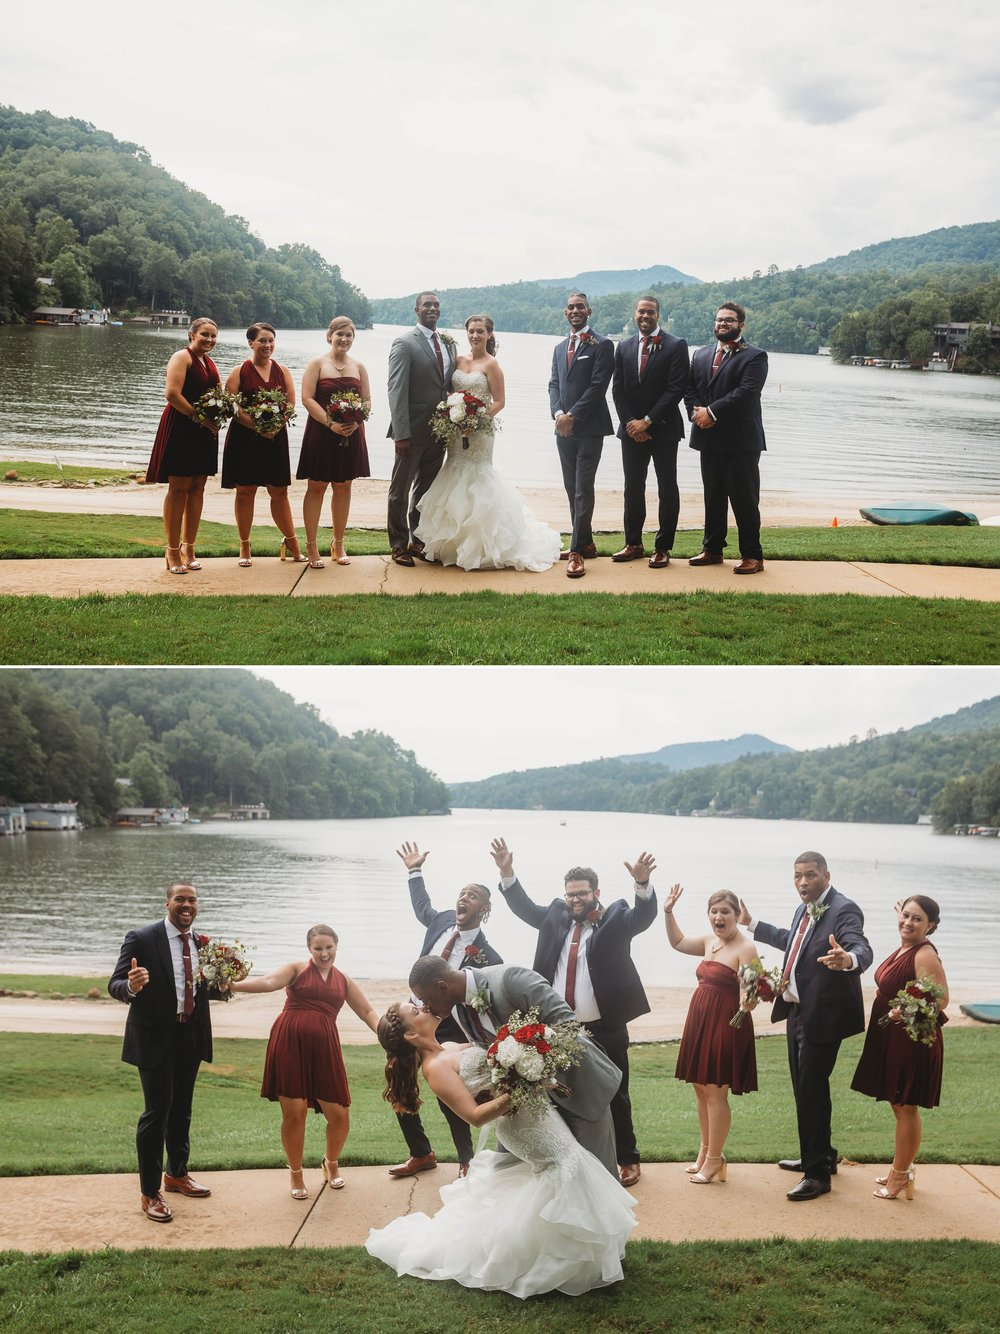 Wedding Party Formals - Rachel + Jamison - Rumbling Bald Resort, Lake Lure, NC - Asheville, North Carolina Wedding Photographer